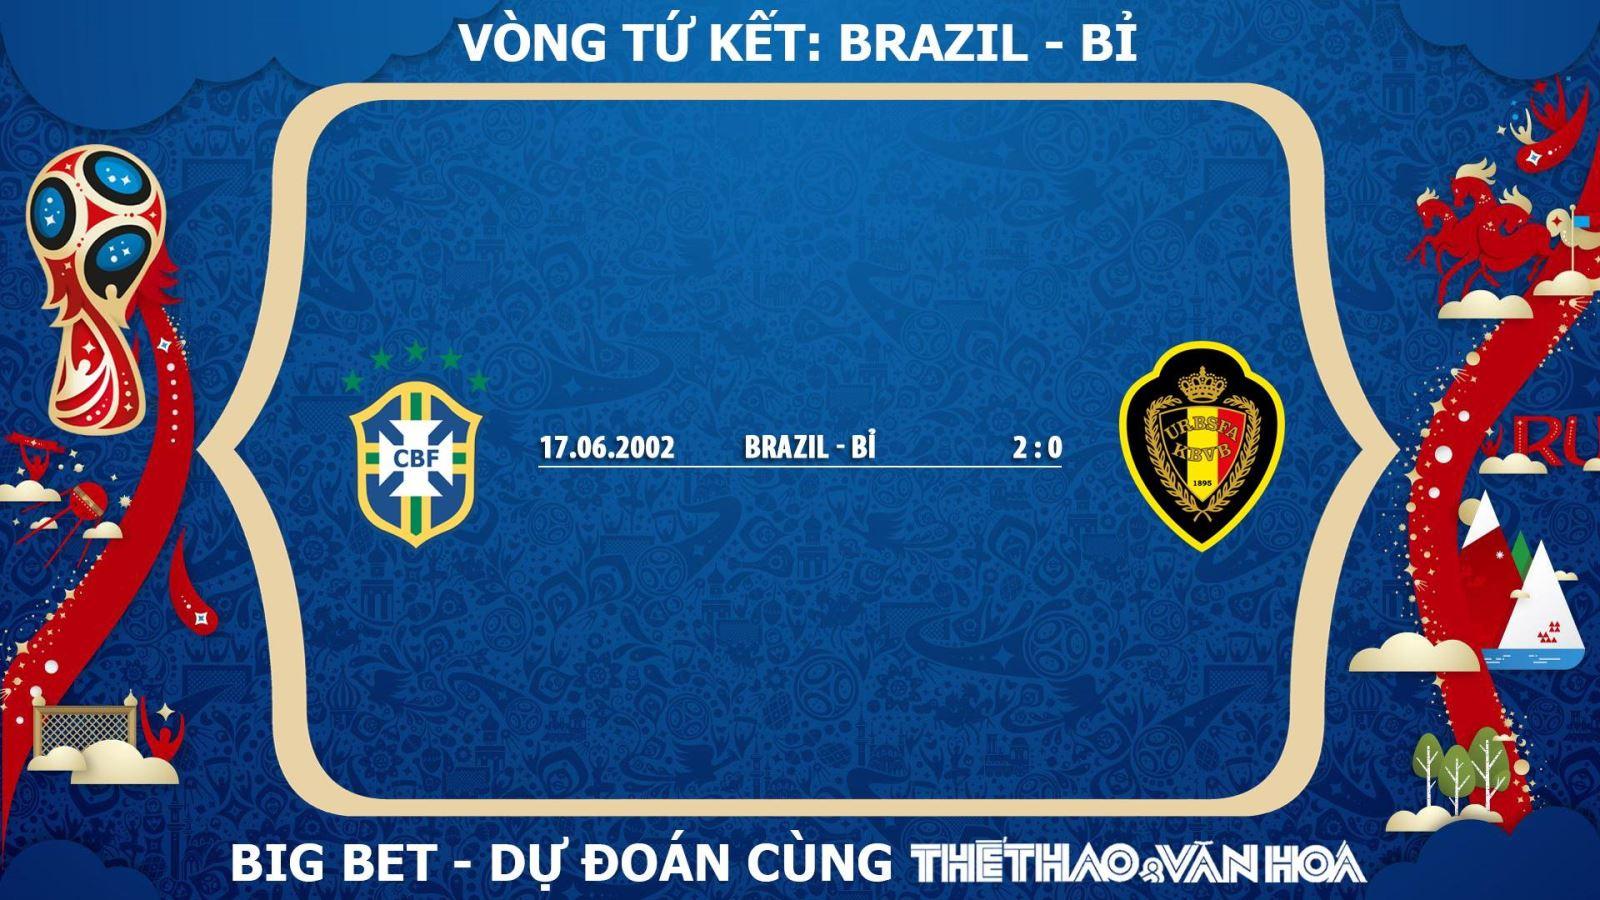 Brazil vs Bỉ, Bỉ vs Brazil, đối đầu Brazil vs Bỉ, Brasil vs Belgium, nhận định Brazil vs Bỉ, trực tiếp Brazil vs Bỉ, trực tiếp Brazil vs Bỉ, xem trực tiếp Brazil vs Bỉ, link trực tiếp Brazil vs Bỉ